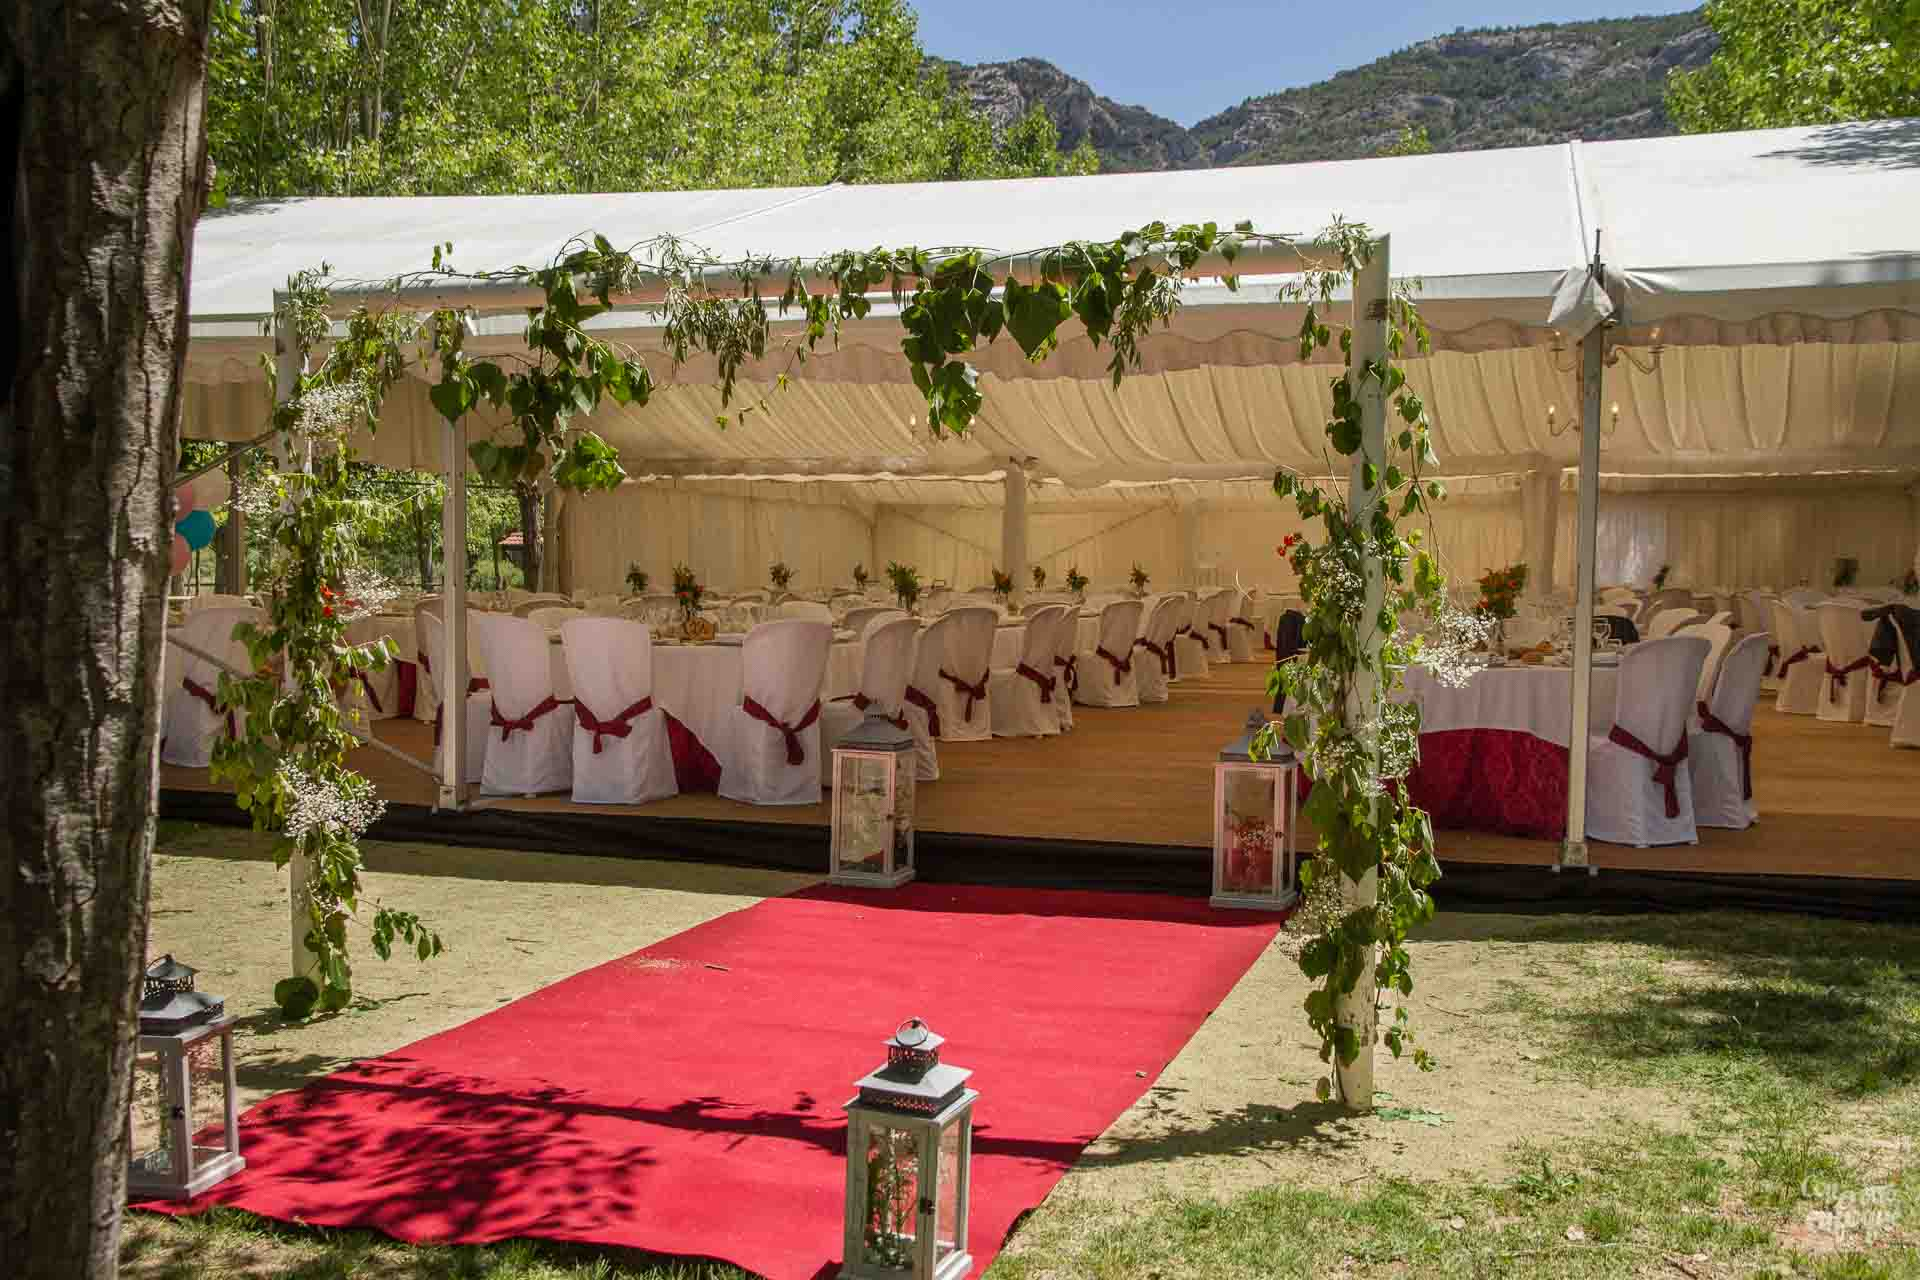 tu boda estilo camping glam. glamou en la naturaleza Teruel Boda al aire libre wedding